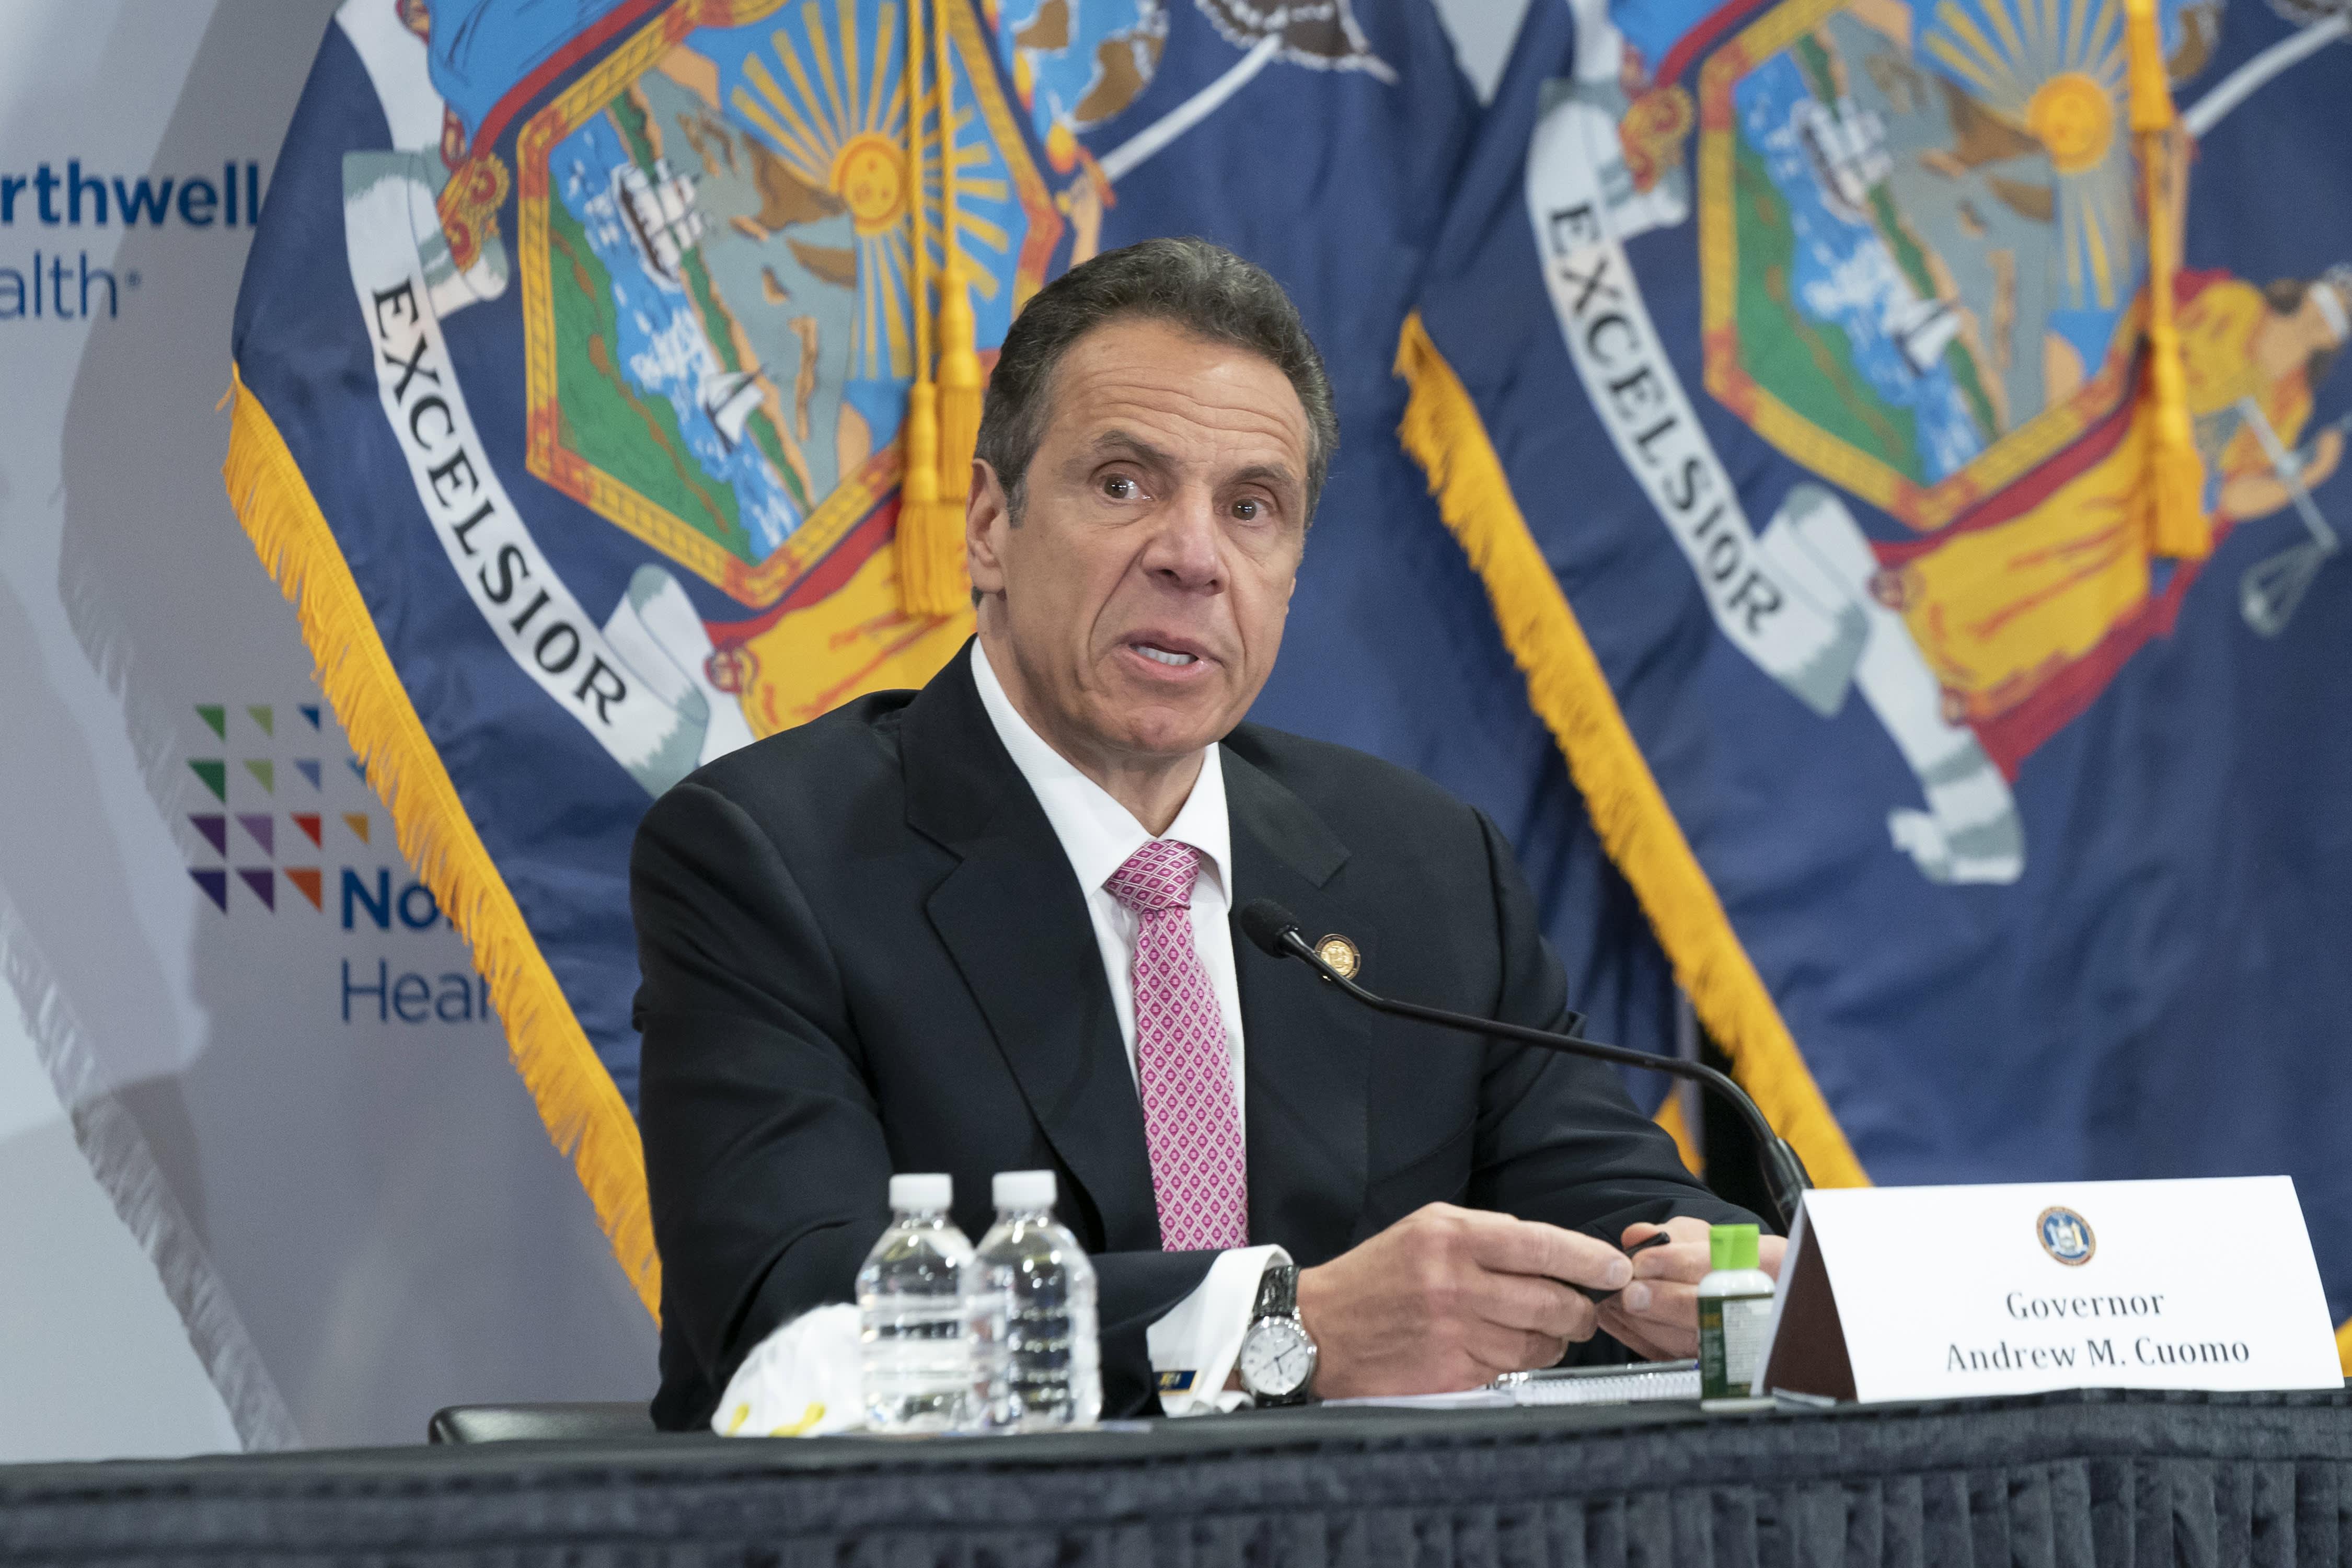 New York Gov. Cuomo says he won't sacrifice human lives to reopen economy